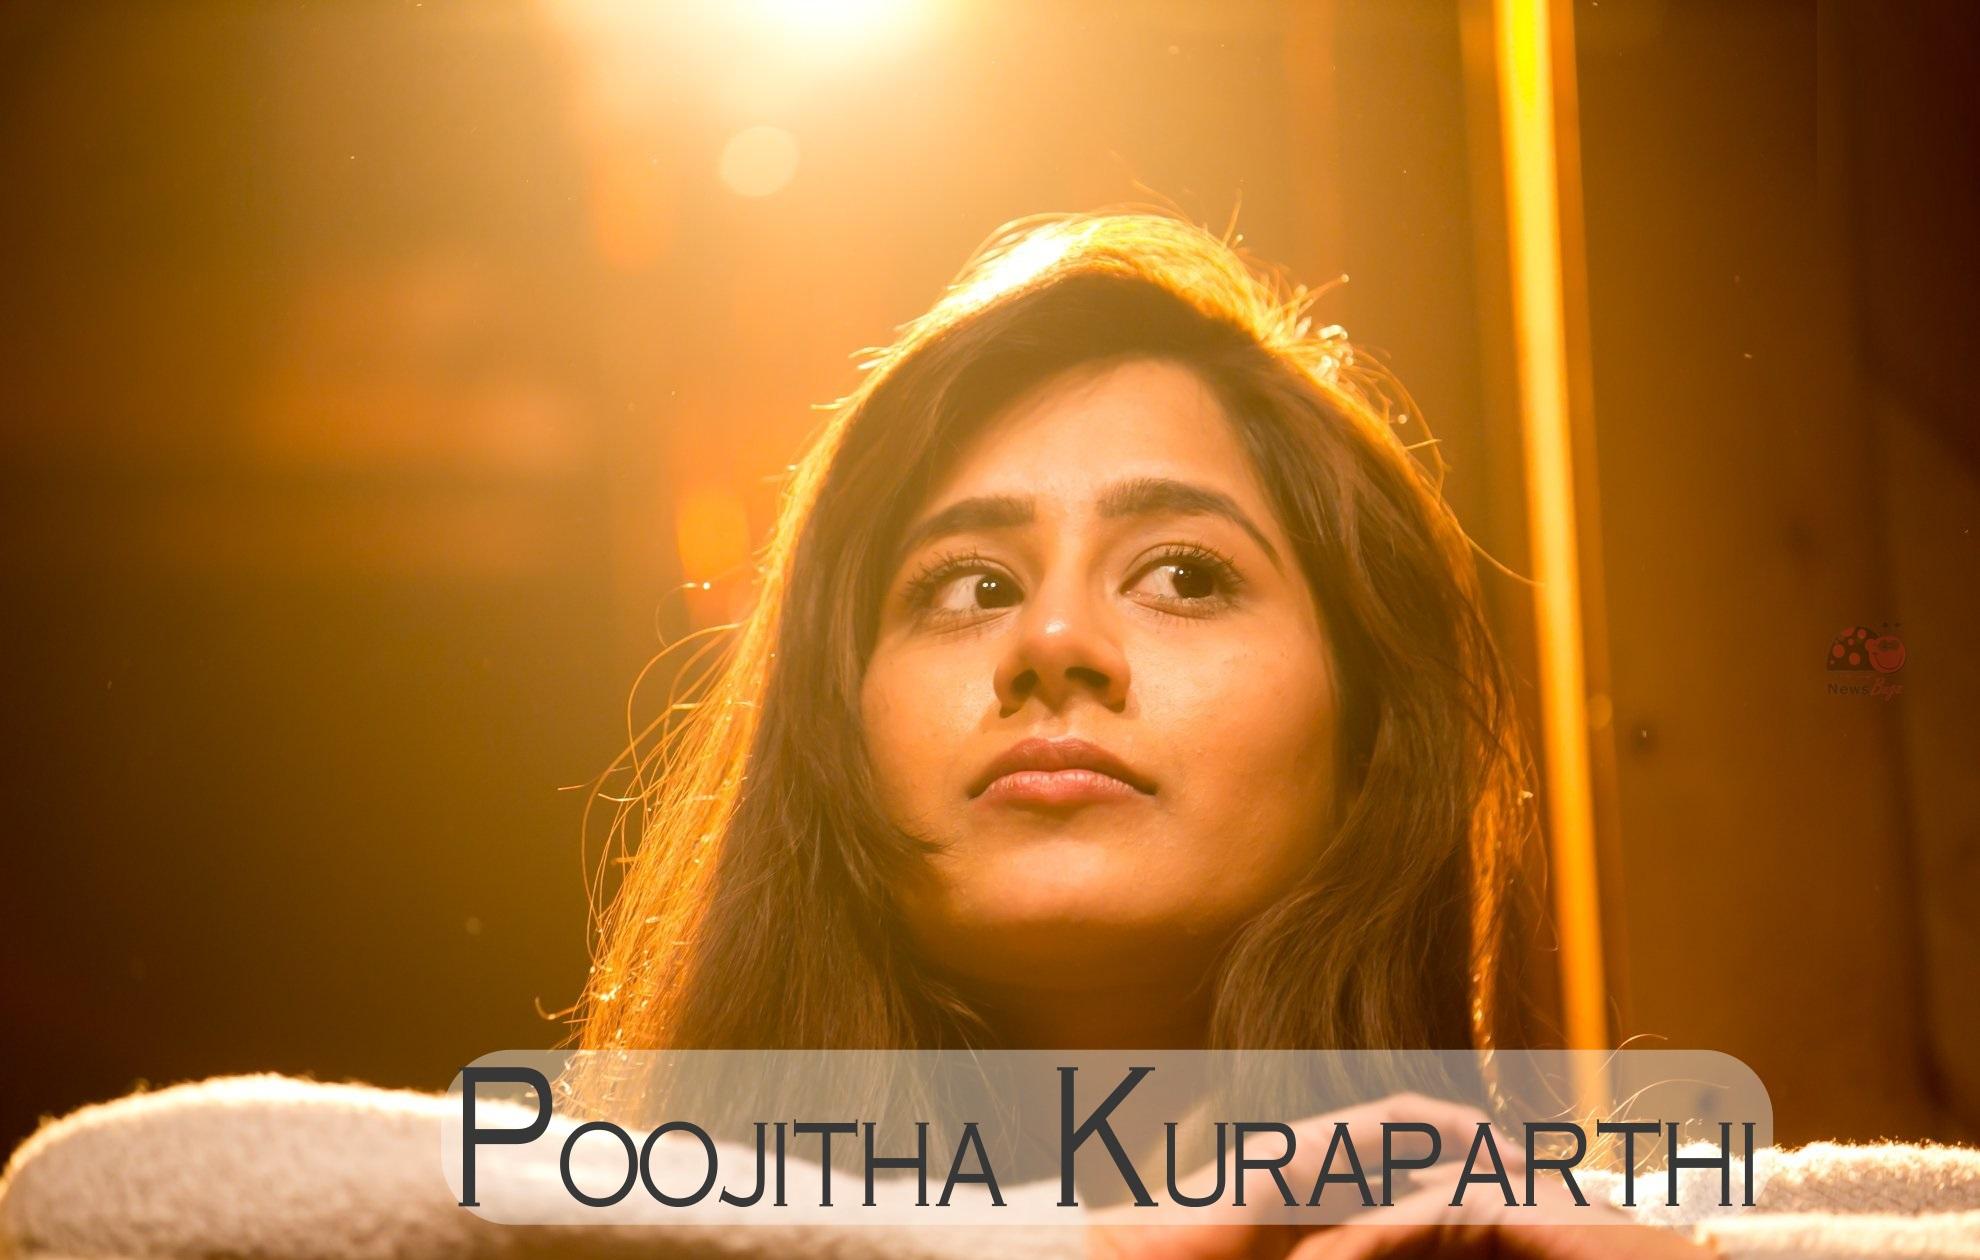 Poojitha Kuraparthi